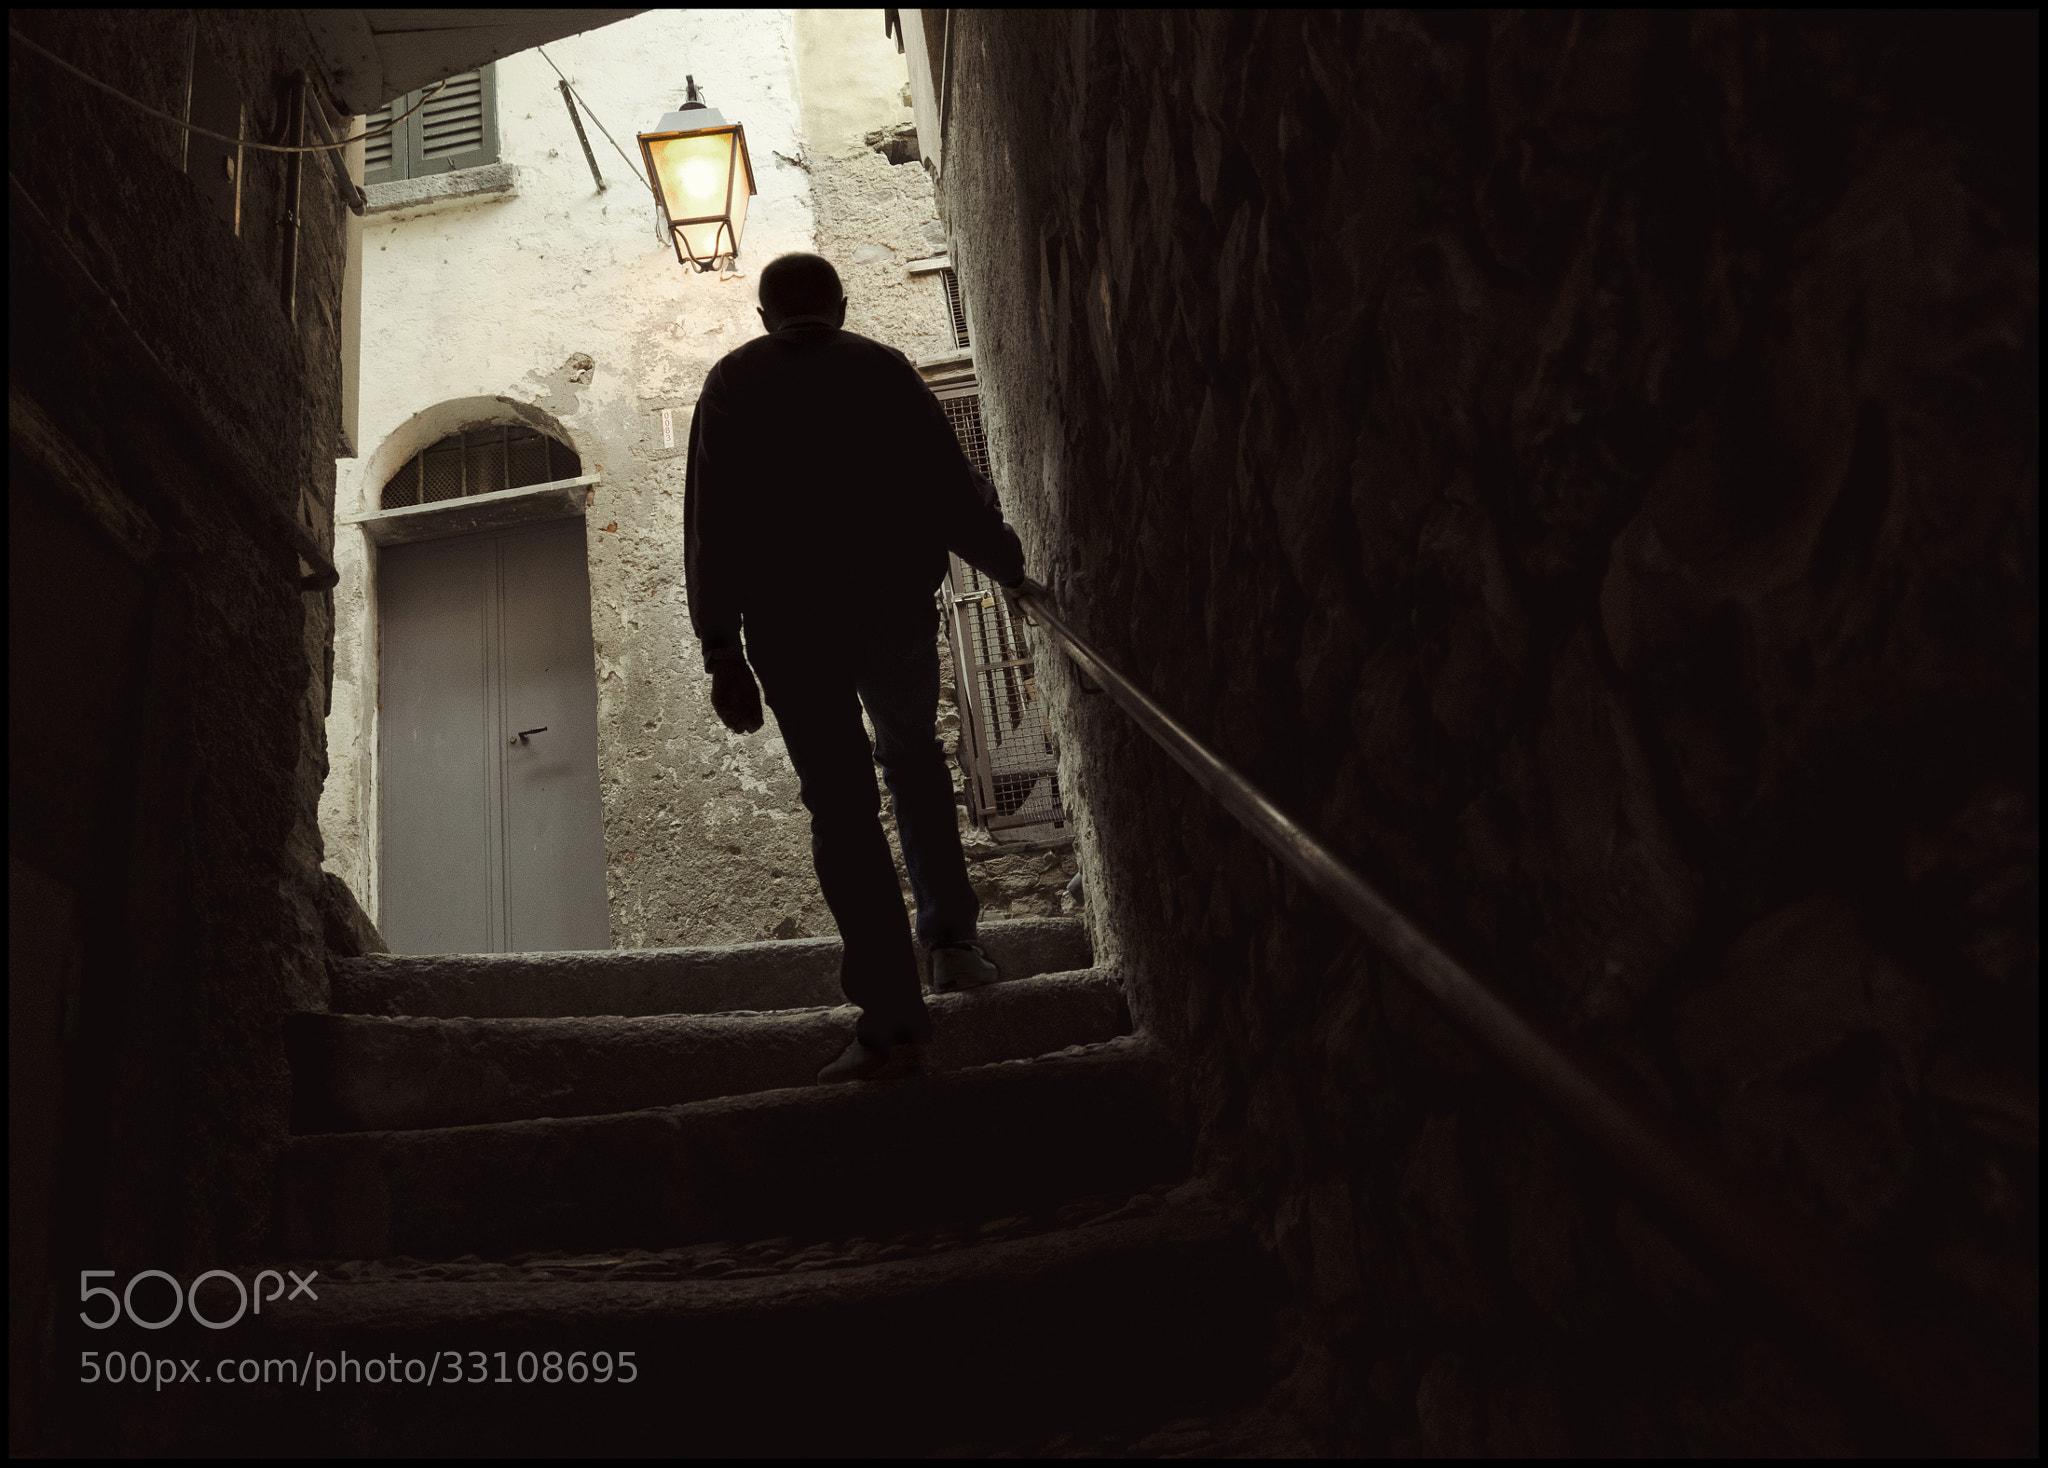 Photograph Last light by gianluca avanzi on 500px